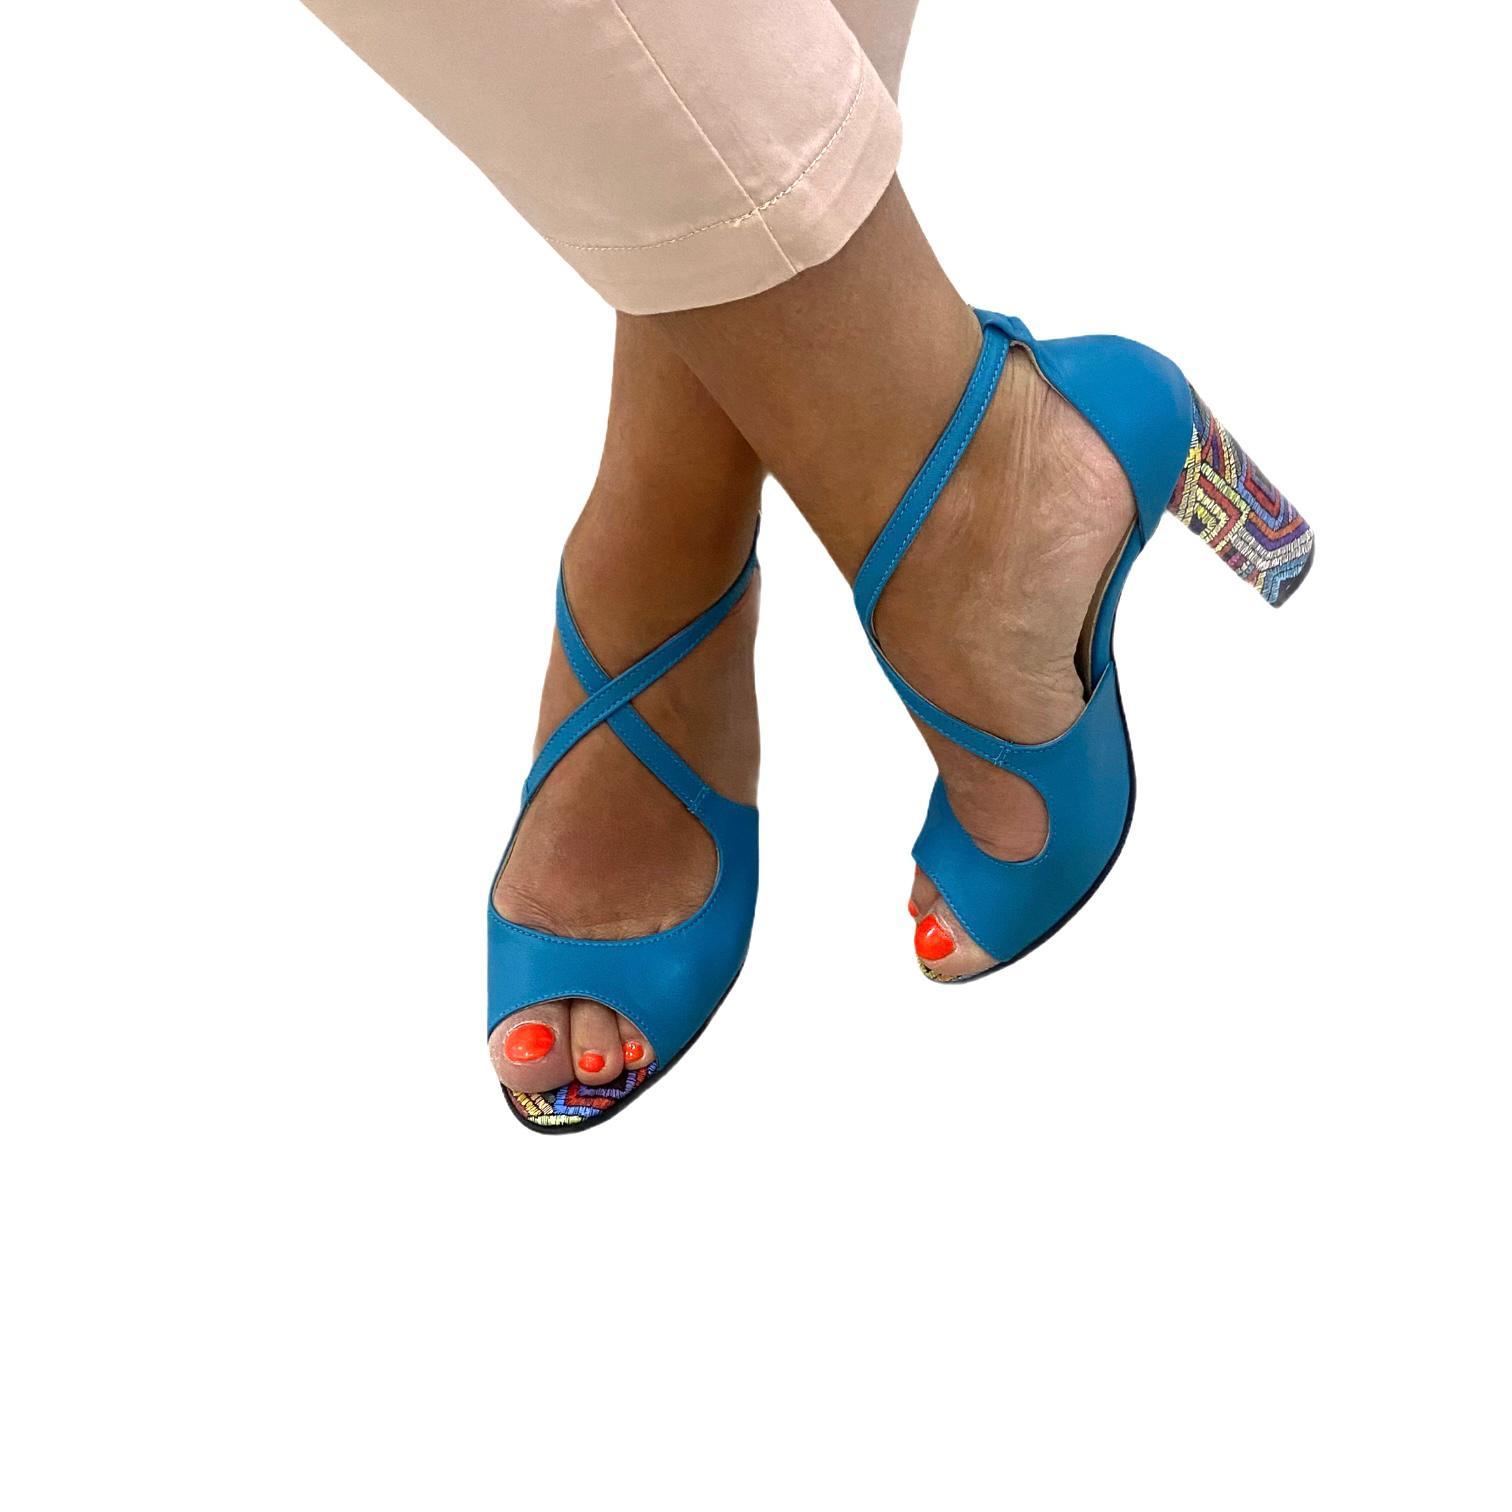 Sandale albastre cu toc colorat si barete incrucisate